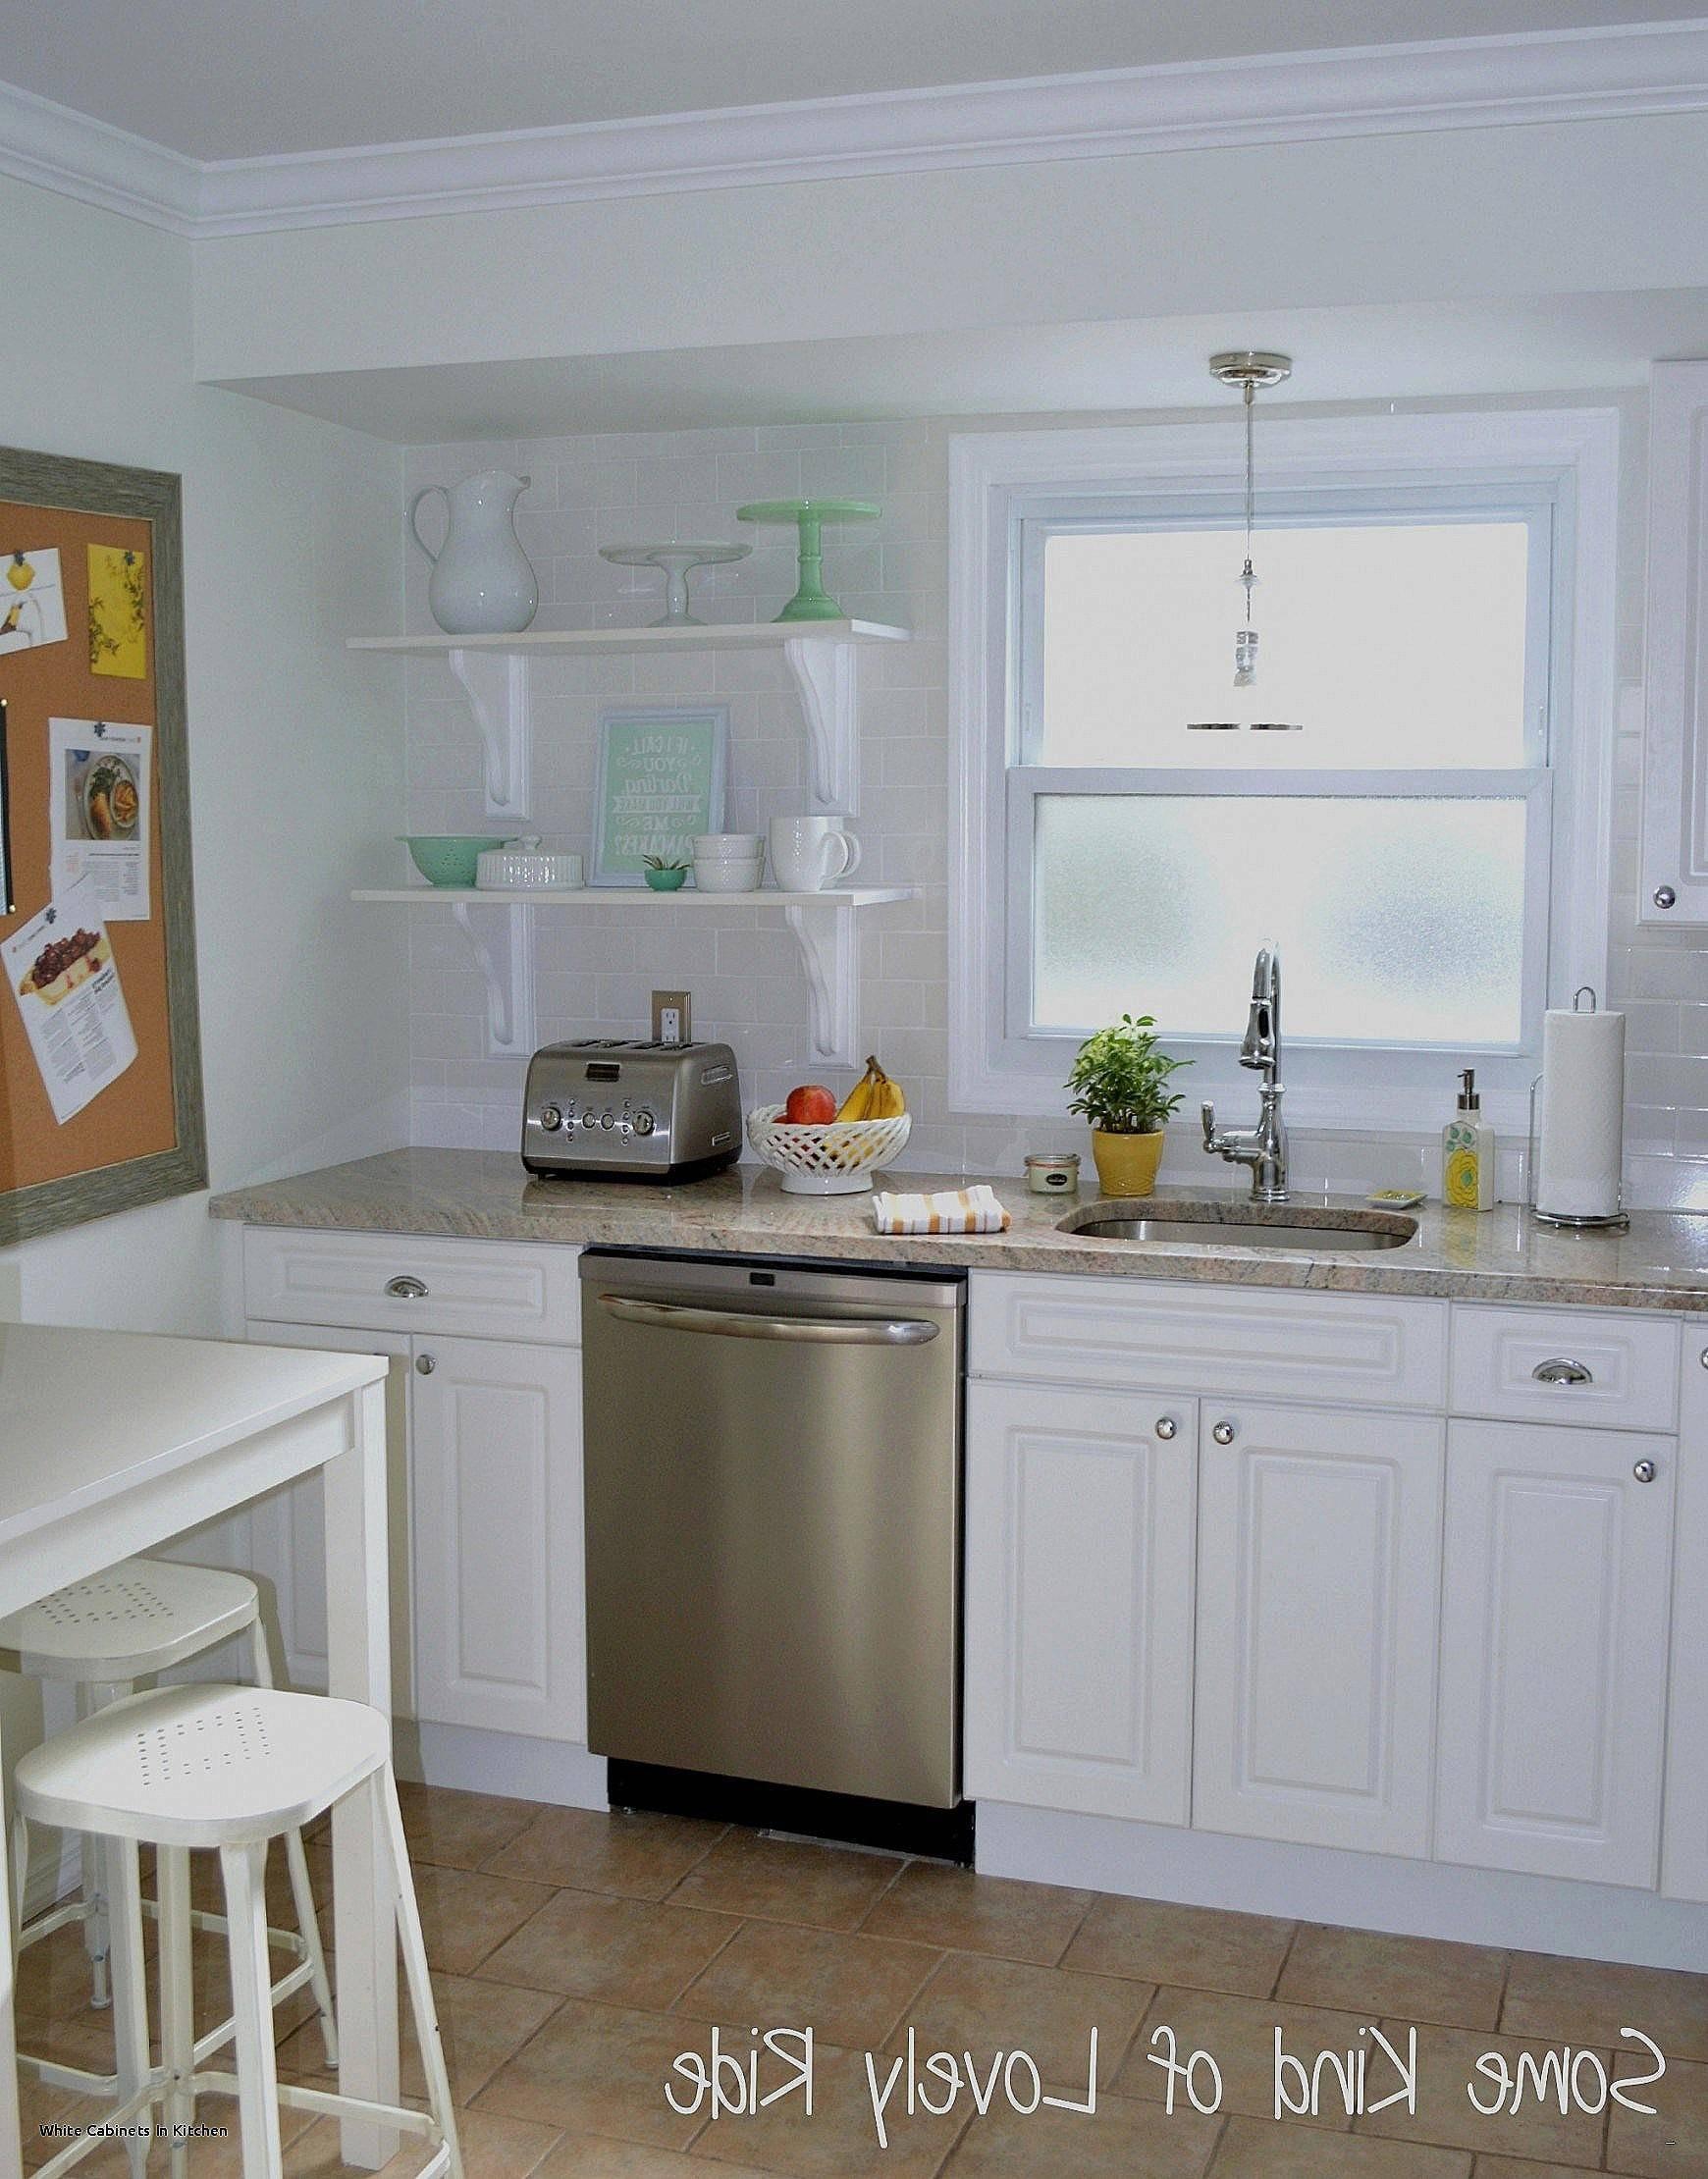 modern kitchen ideas yellow new awesome yellow kitchen ideas of modern kitchen ideas yellow